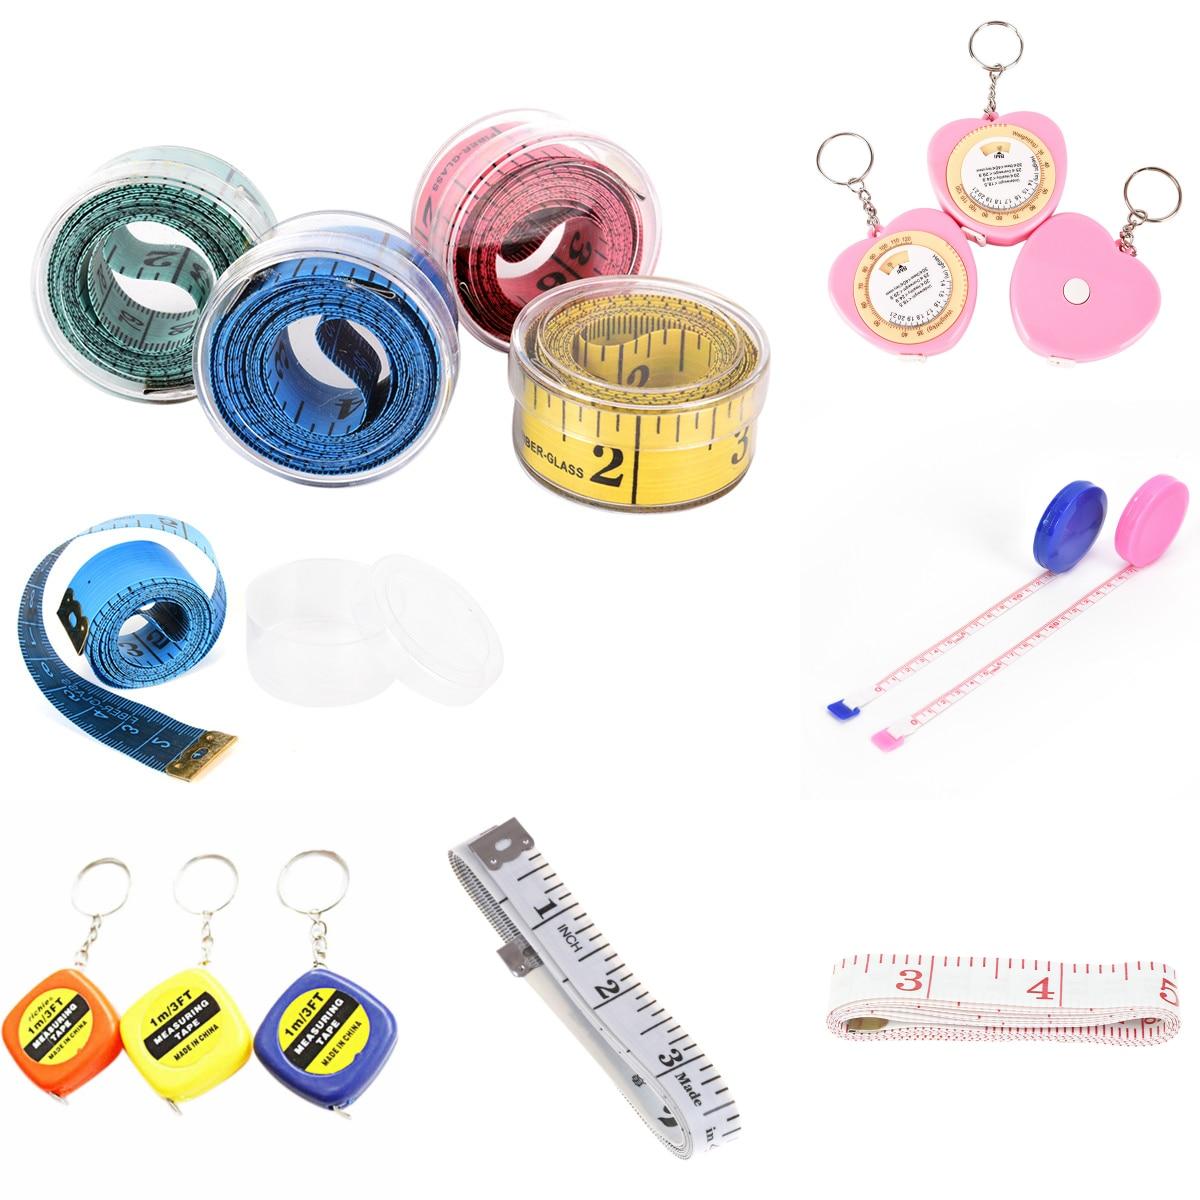 Body Measuring Ruler Sewing Tailor Tape Measure Soft Flat Sewing Ruler Meter Sewing Measuring Tape Random Color